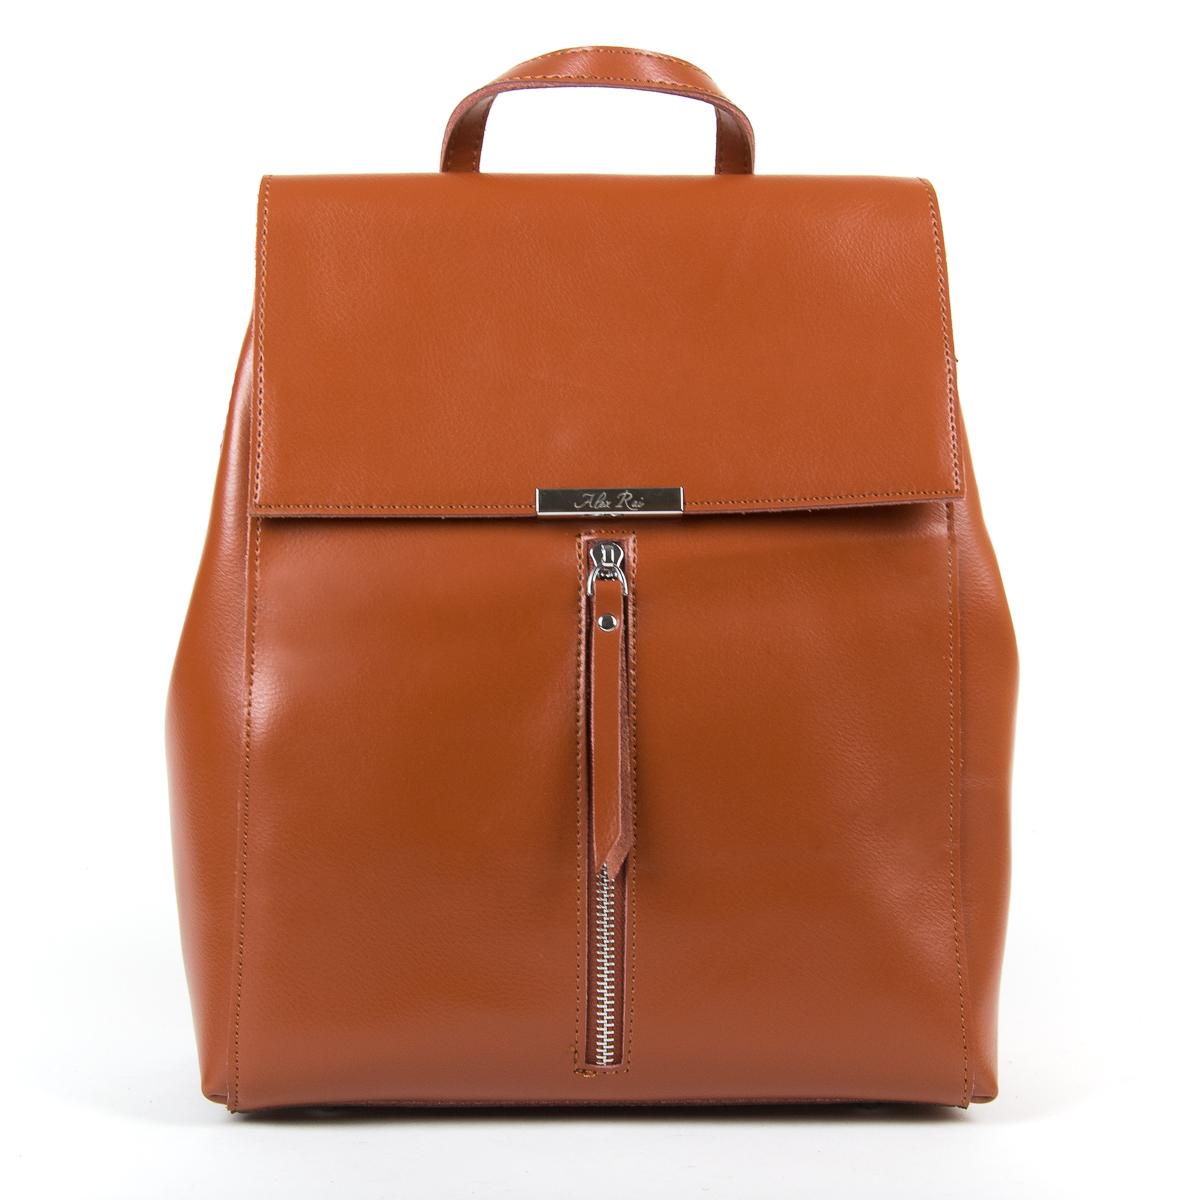 Сумка Женская Рюкзак кожа ALEX RAI 9-01 373 khaki